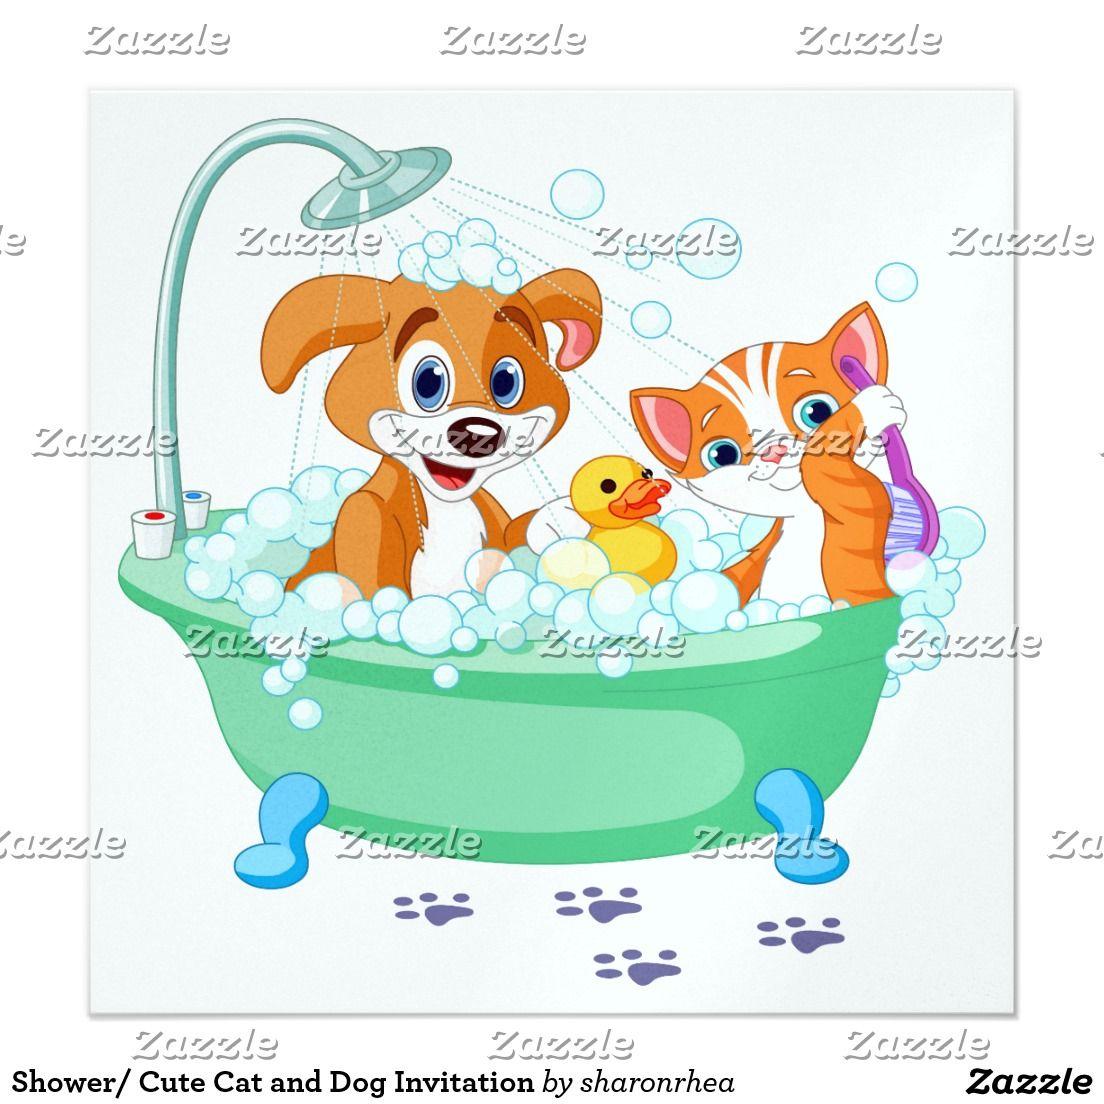 Shower Cute Cat And Dog Invitation Zazzle Com Cute Cats And Dogs Very Cute Dogs Cute Cat